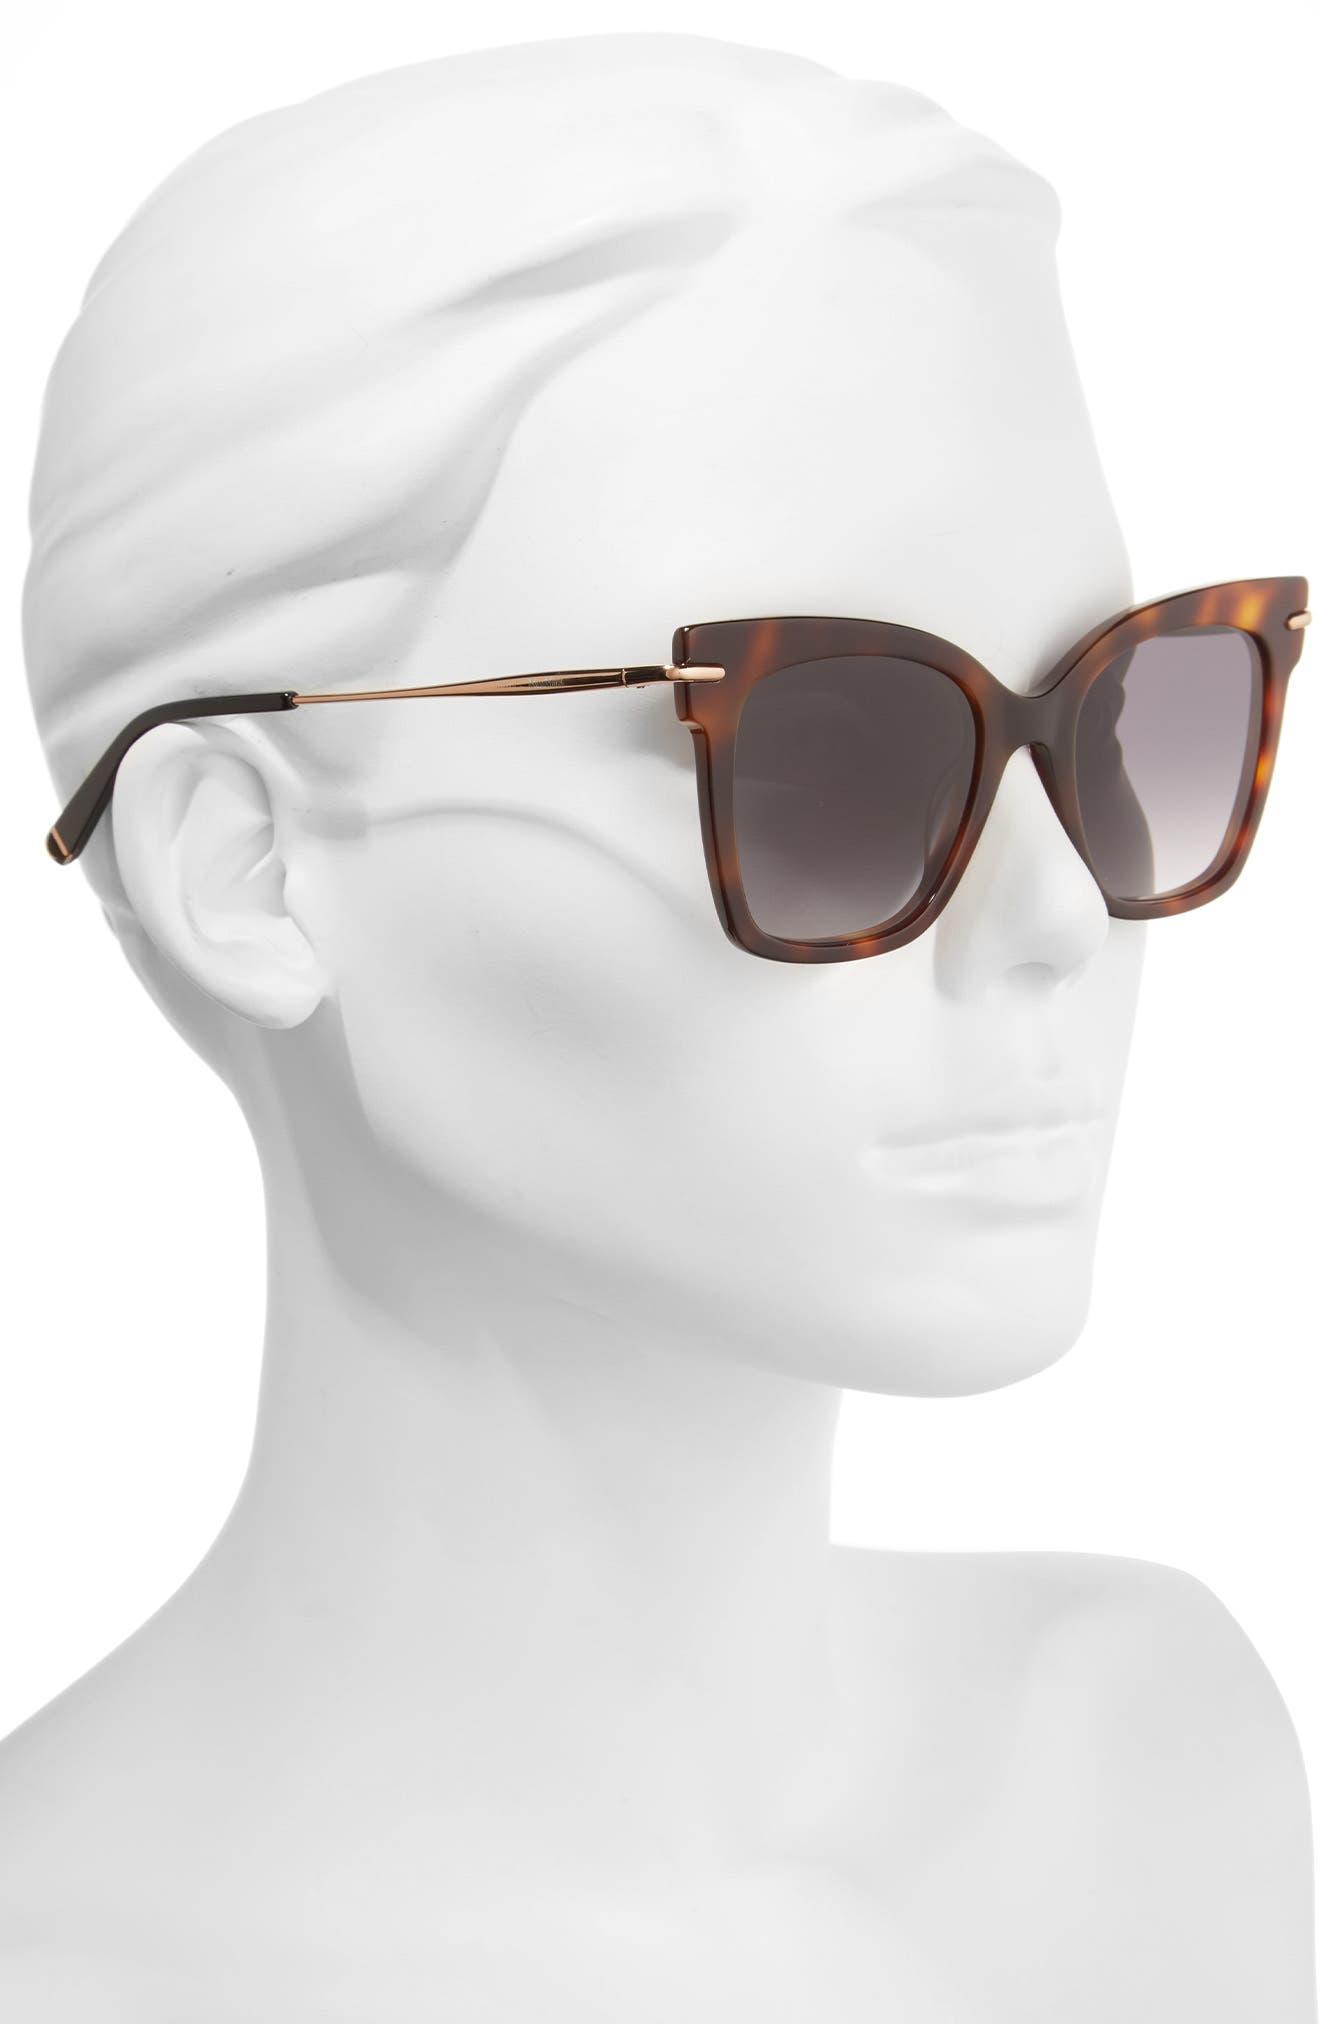 Needliv 49mm Gradient Cat Eye Sunglasses,                             Alternate thumbnail 2, color,                             001